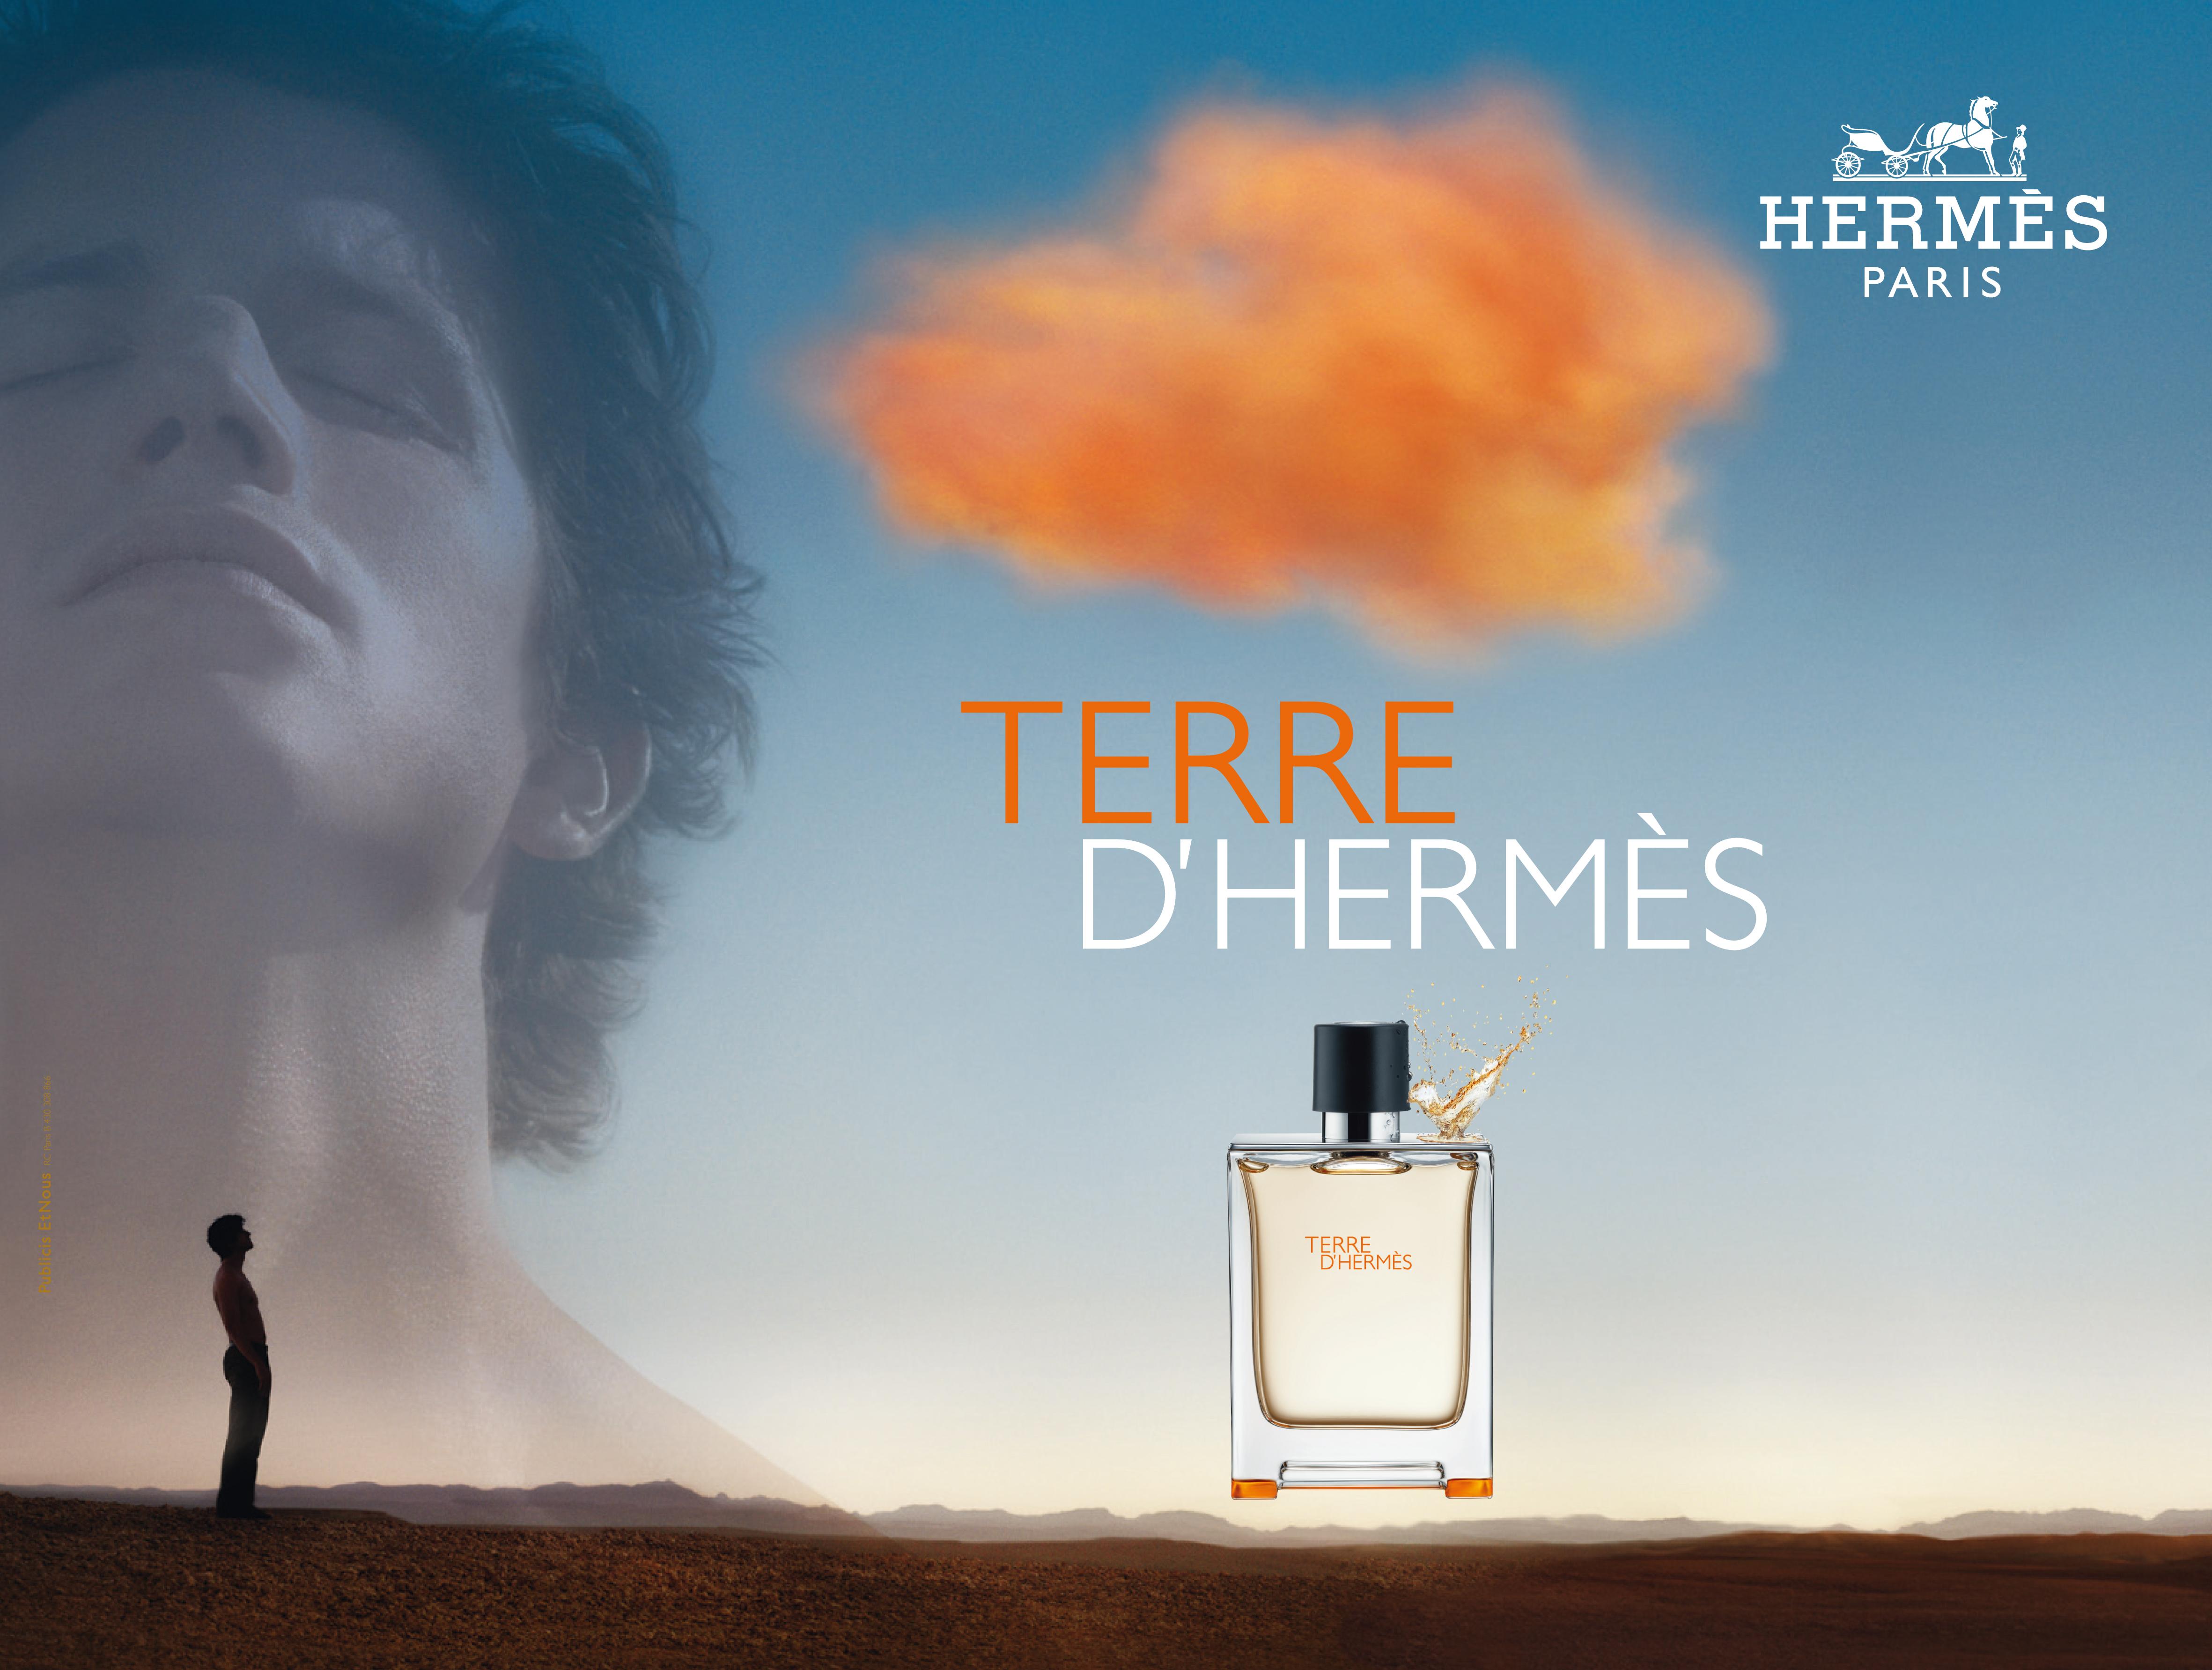 hermes perfume terre d hermes by nicolas dumont at. Black Bedroom Furniture Sets. Home Design Ideas